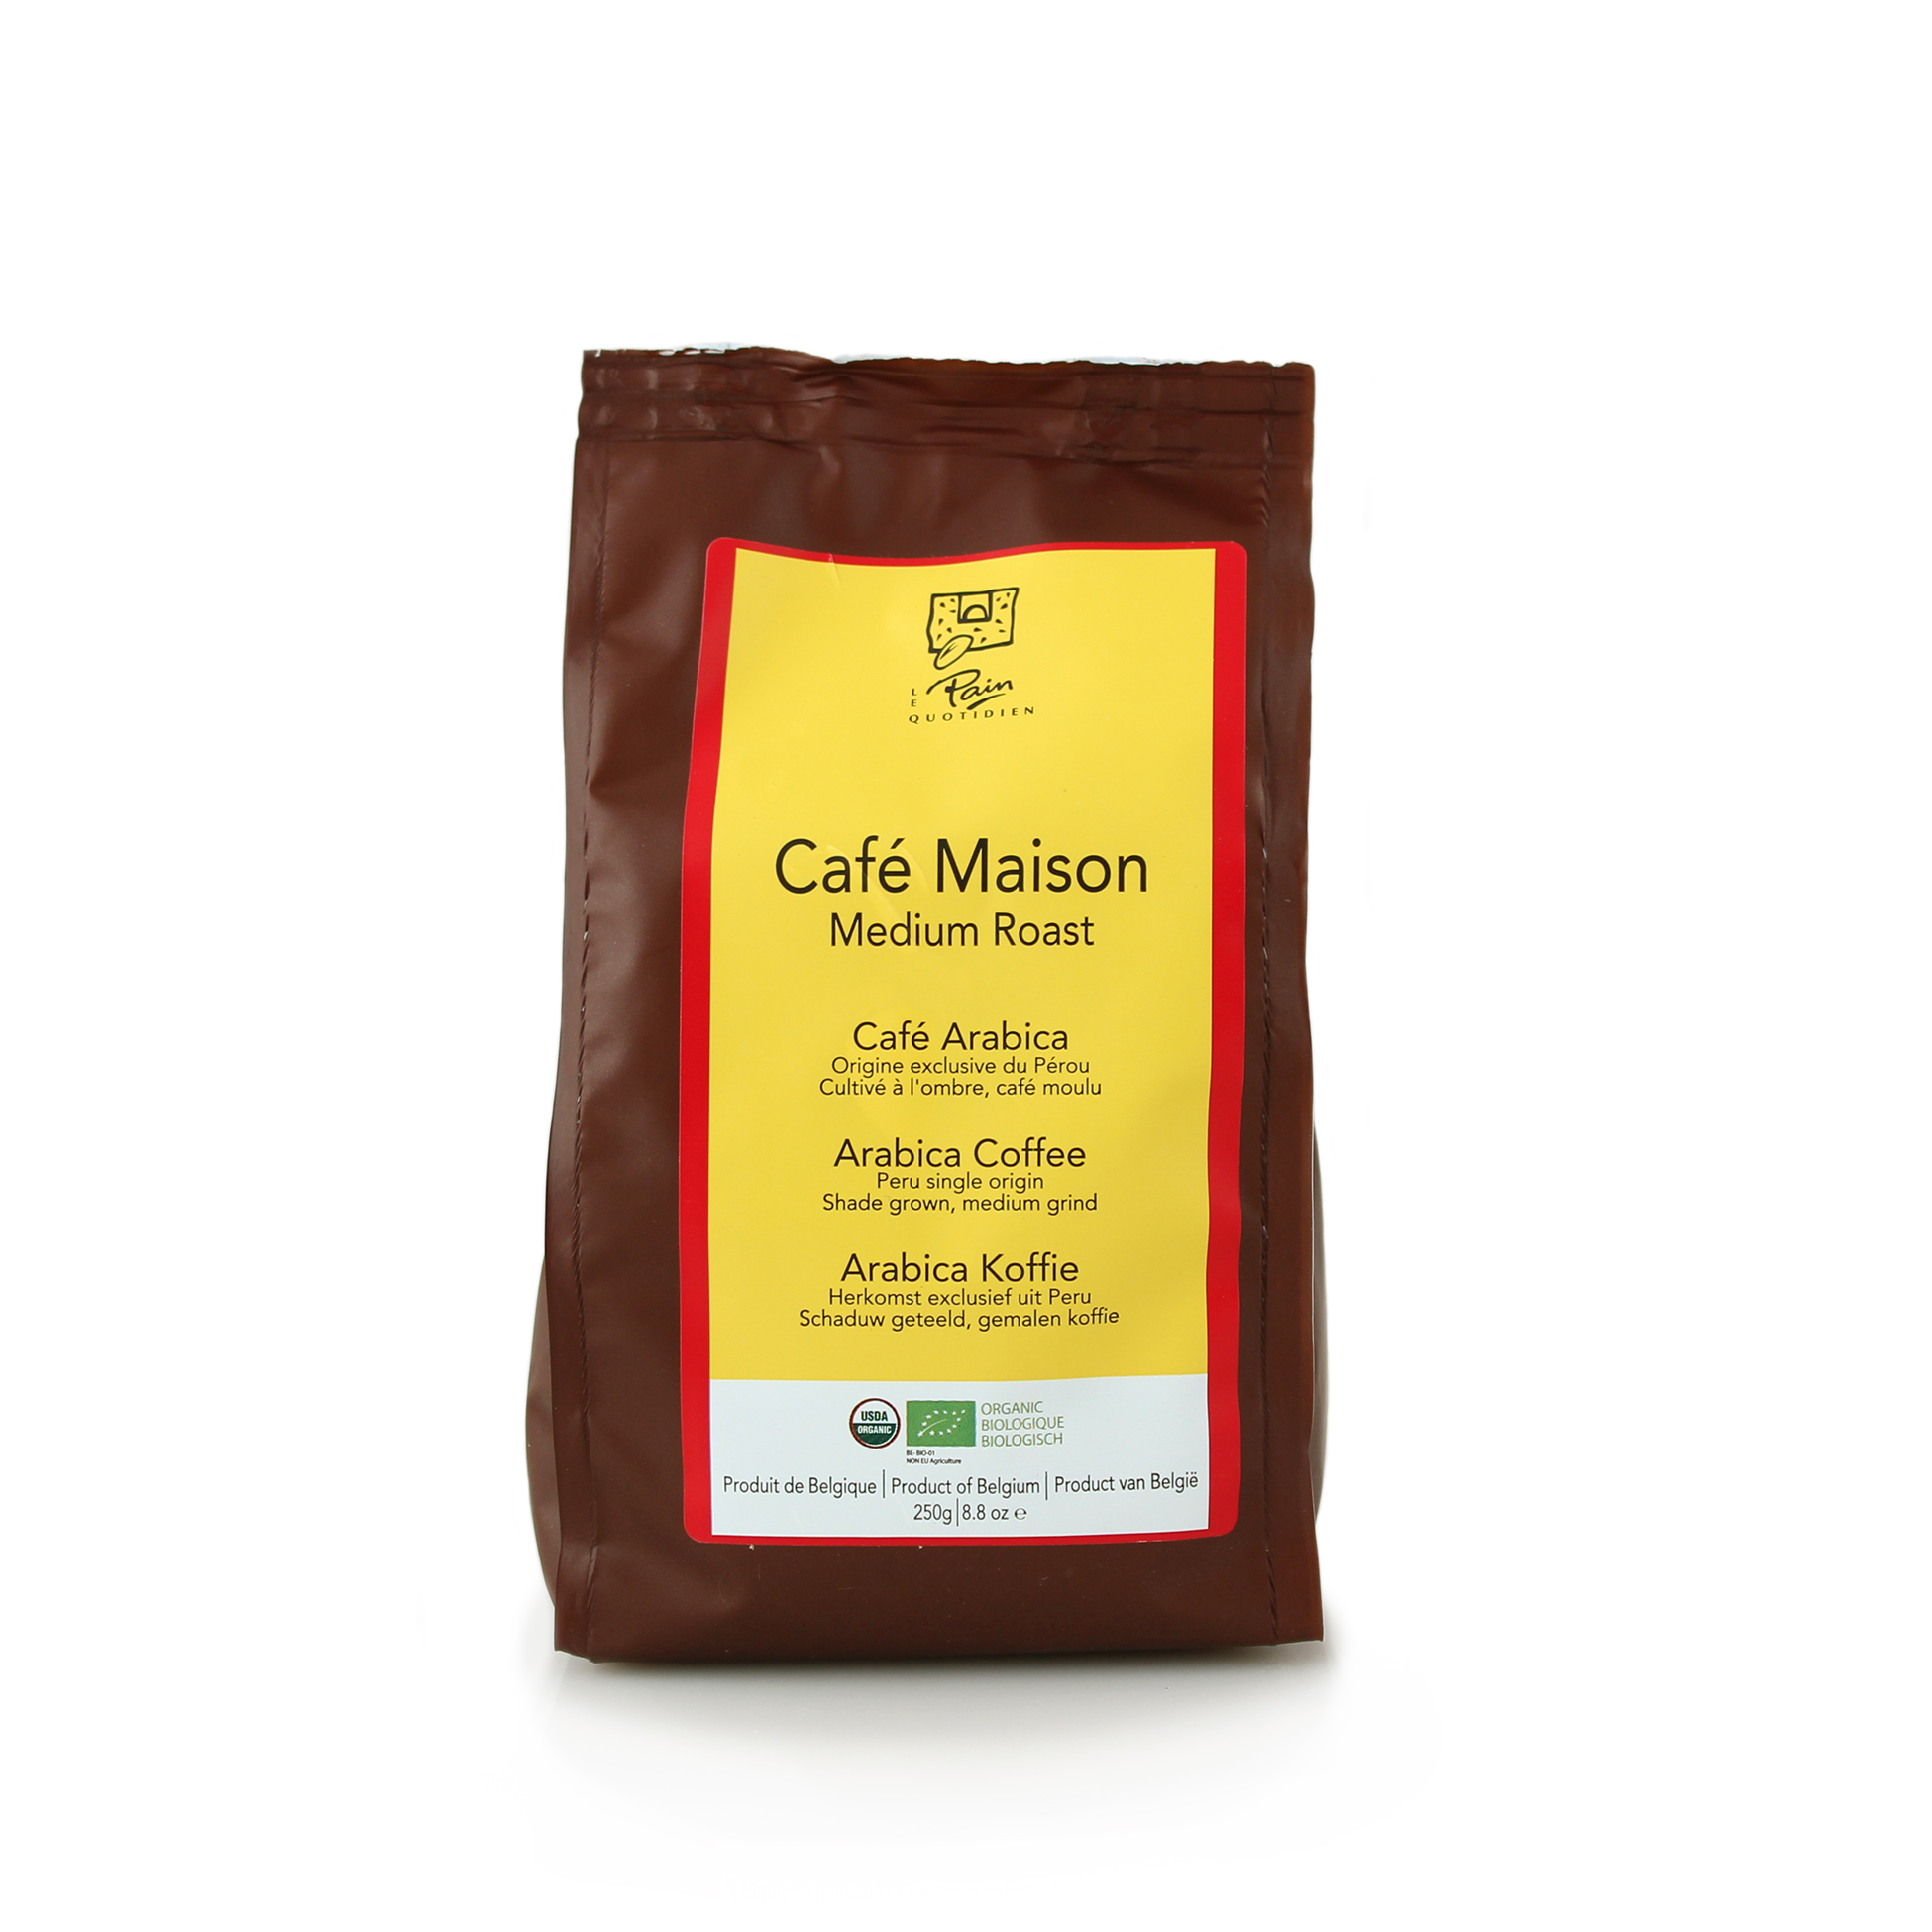 Cafe Maison Medium Roast Ground Coffee